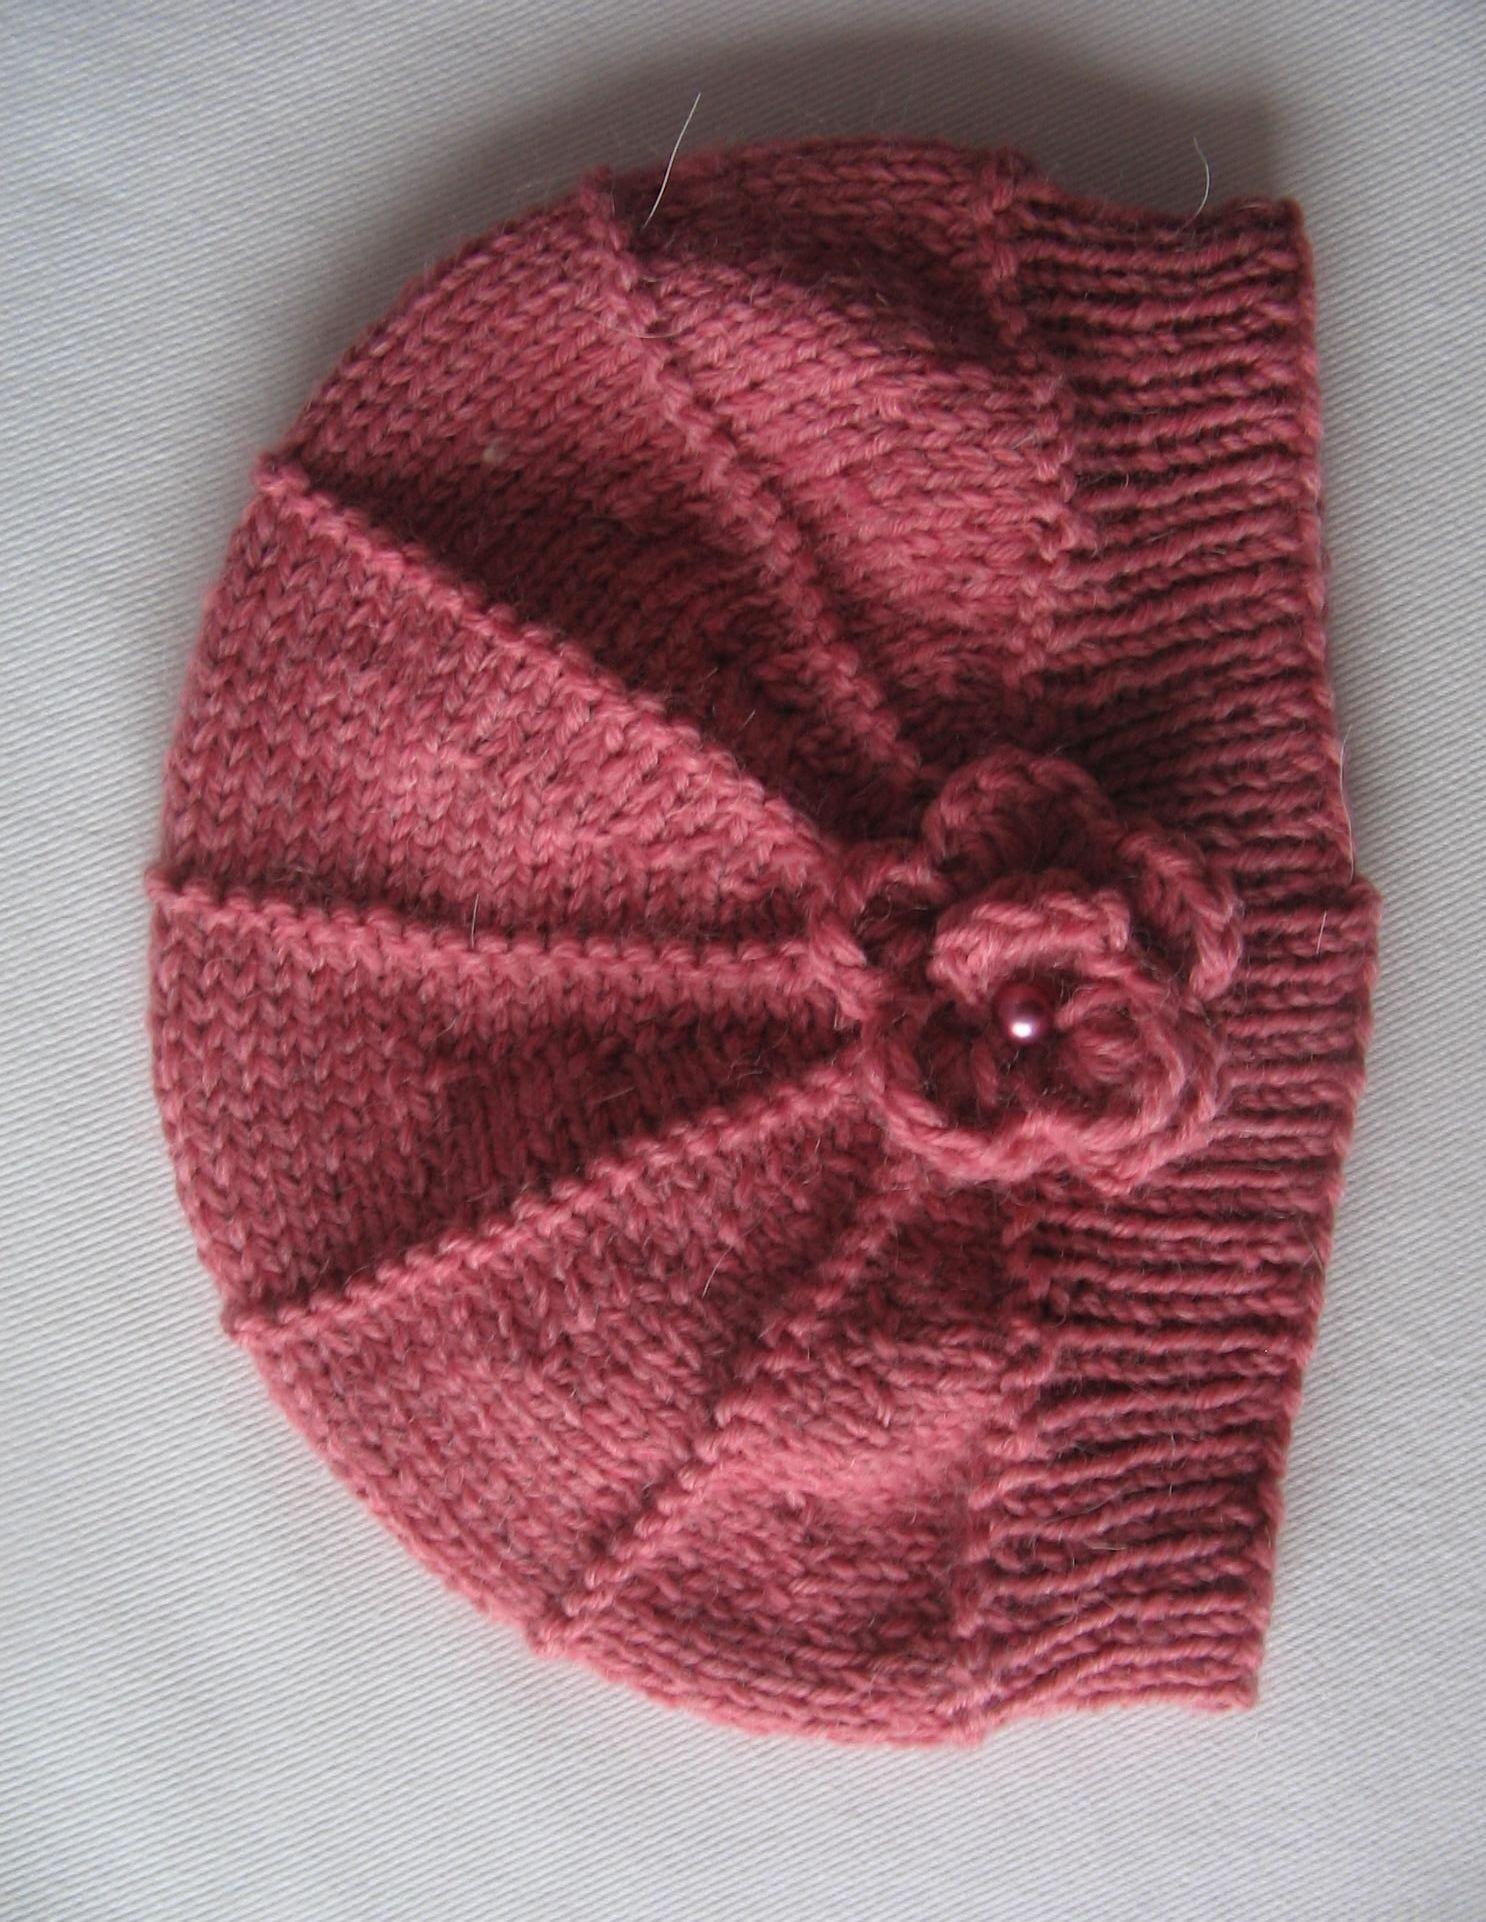 tuto shawl pour b b mes petites activit s tricot pinterest knitted hats tricot crochet. Black Bedroom Furniture Sets. Home Design Ideas